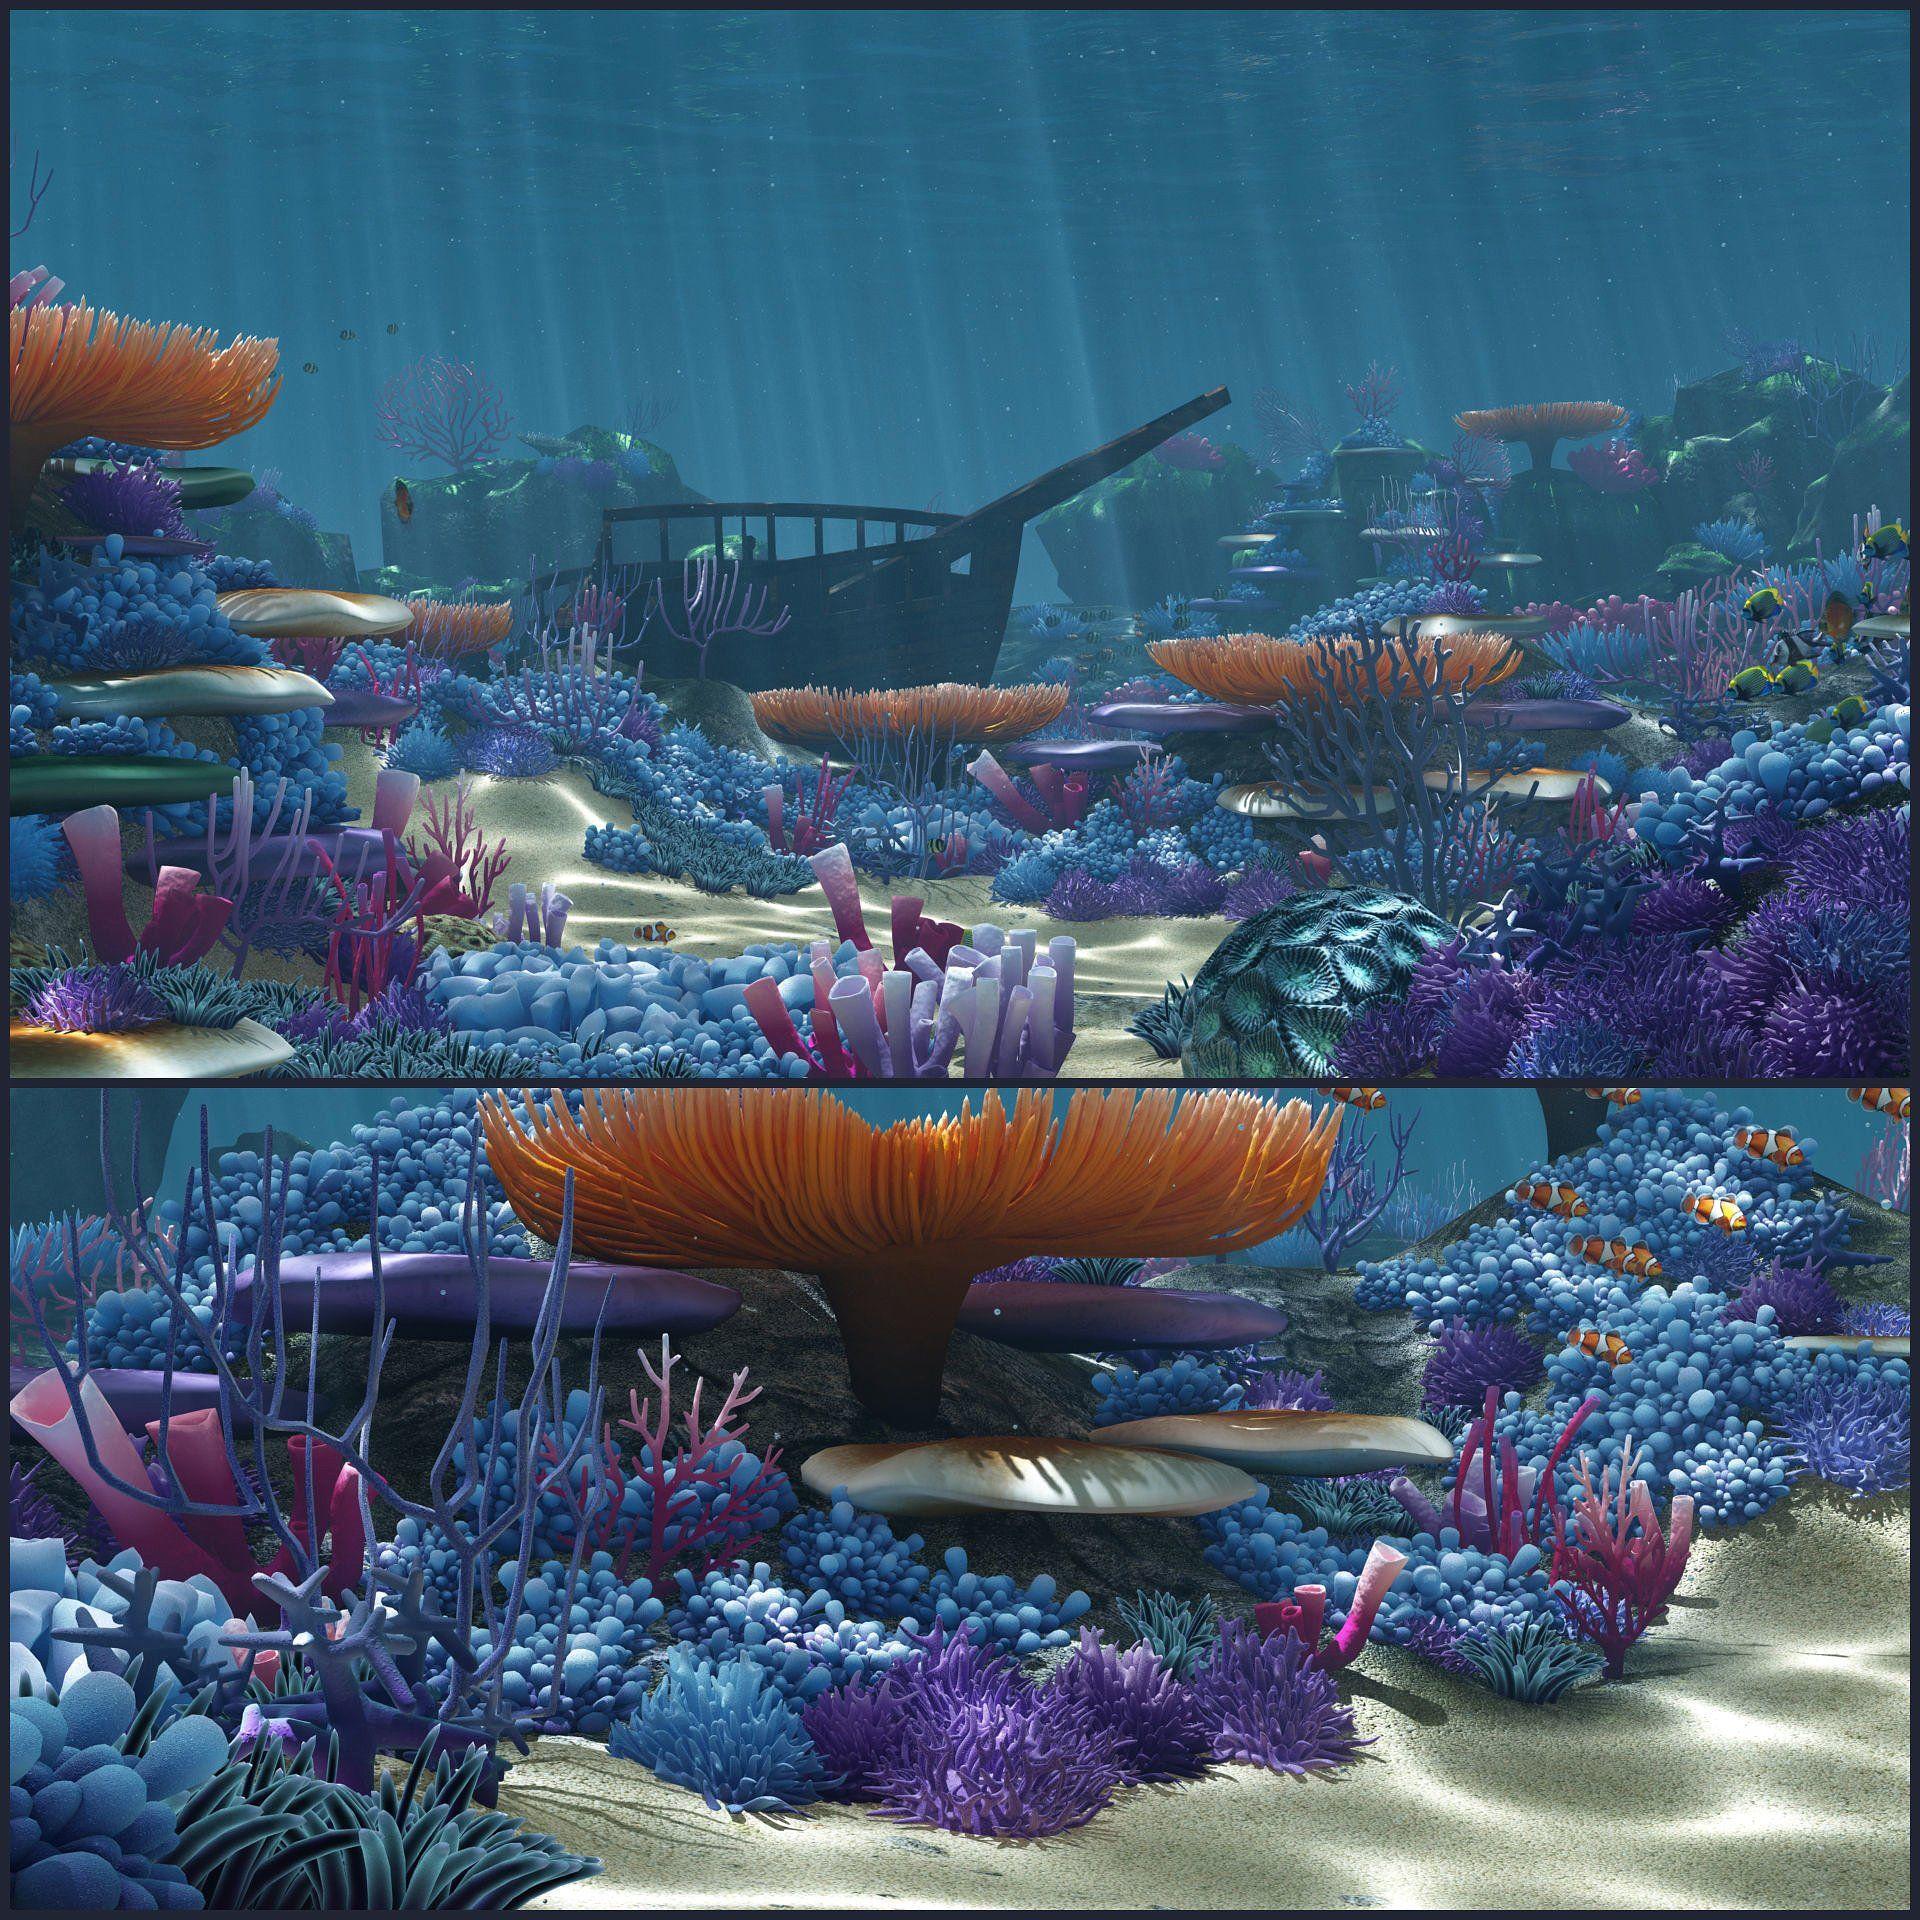 Cartoon Underwater VR/AR Lowpoly 3D Plante